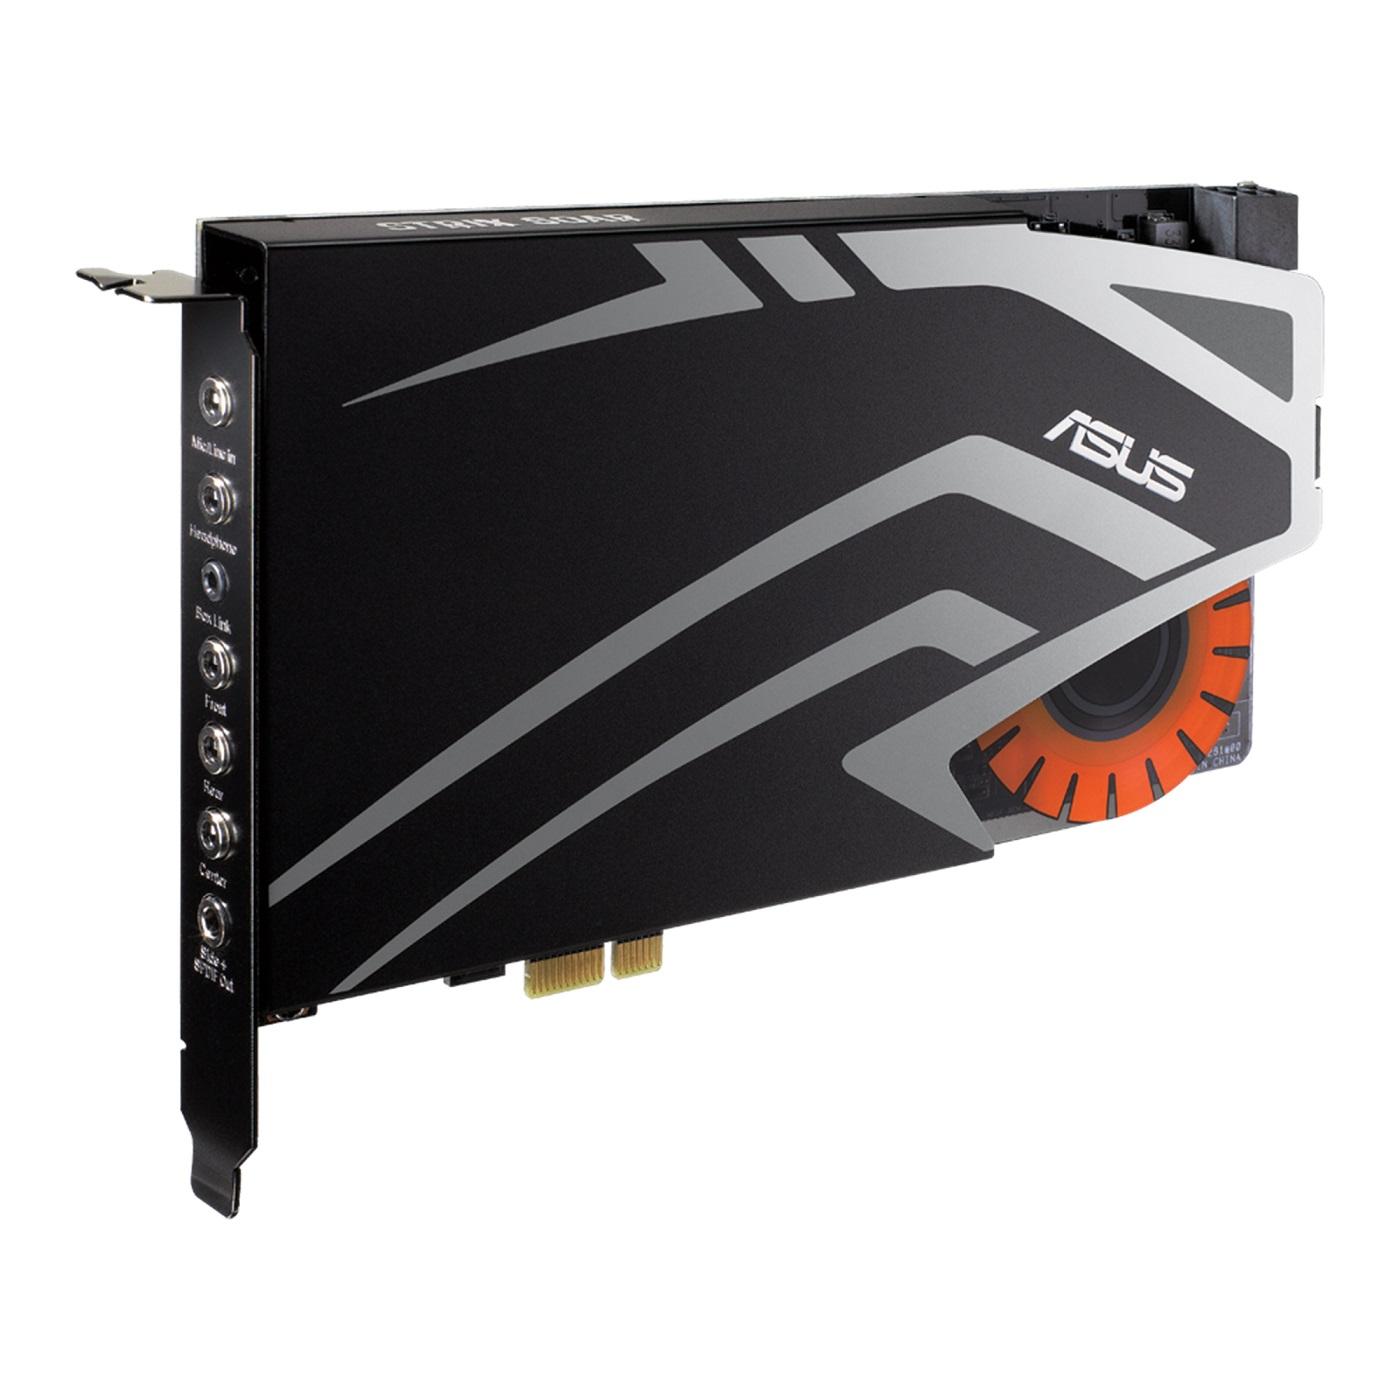 ASUS STRIX SOAR - 7.1 PCIe